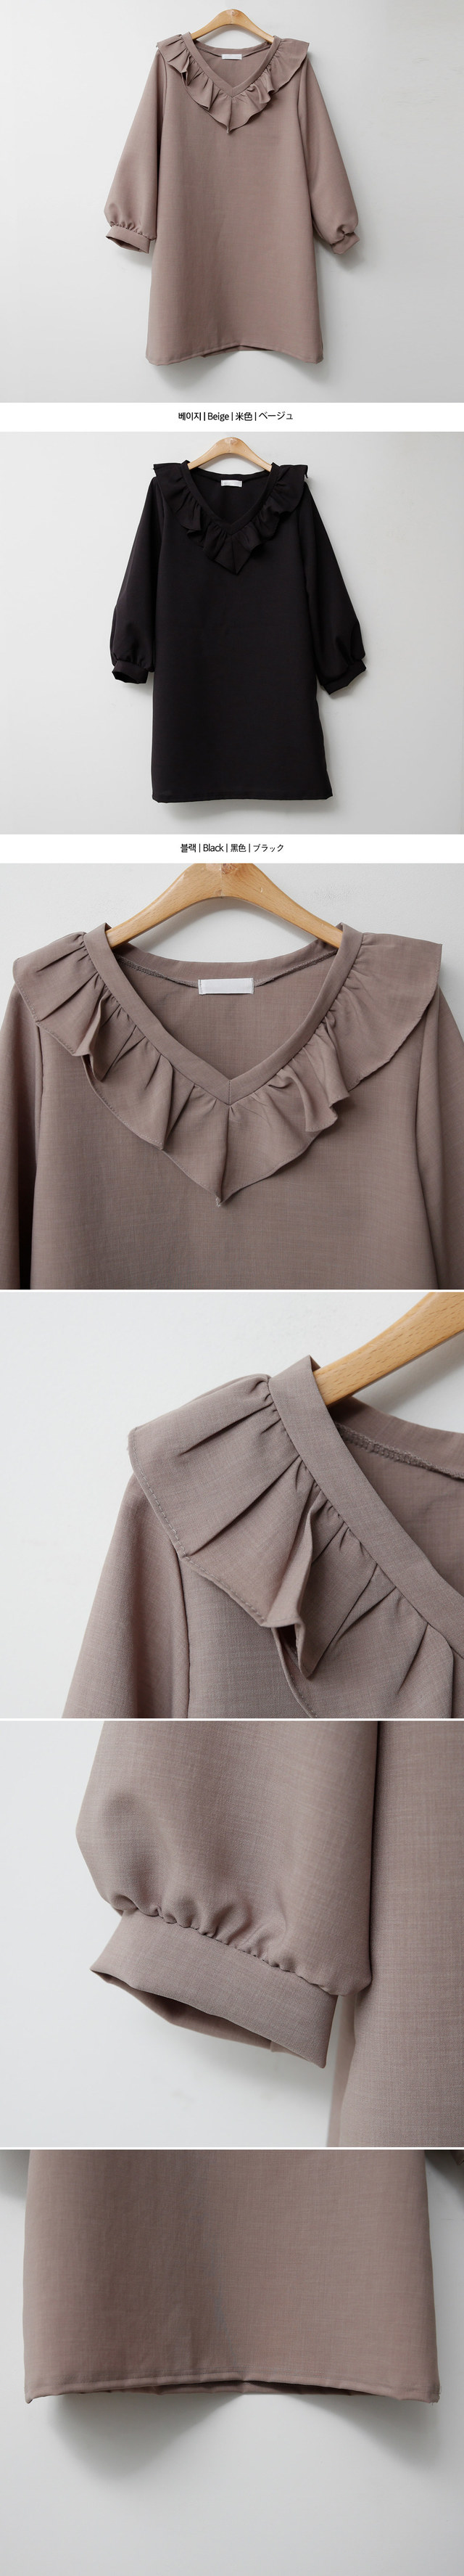 Pine Devil Dress